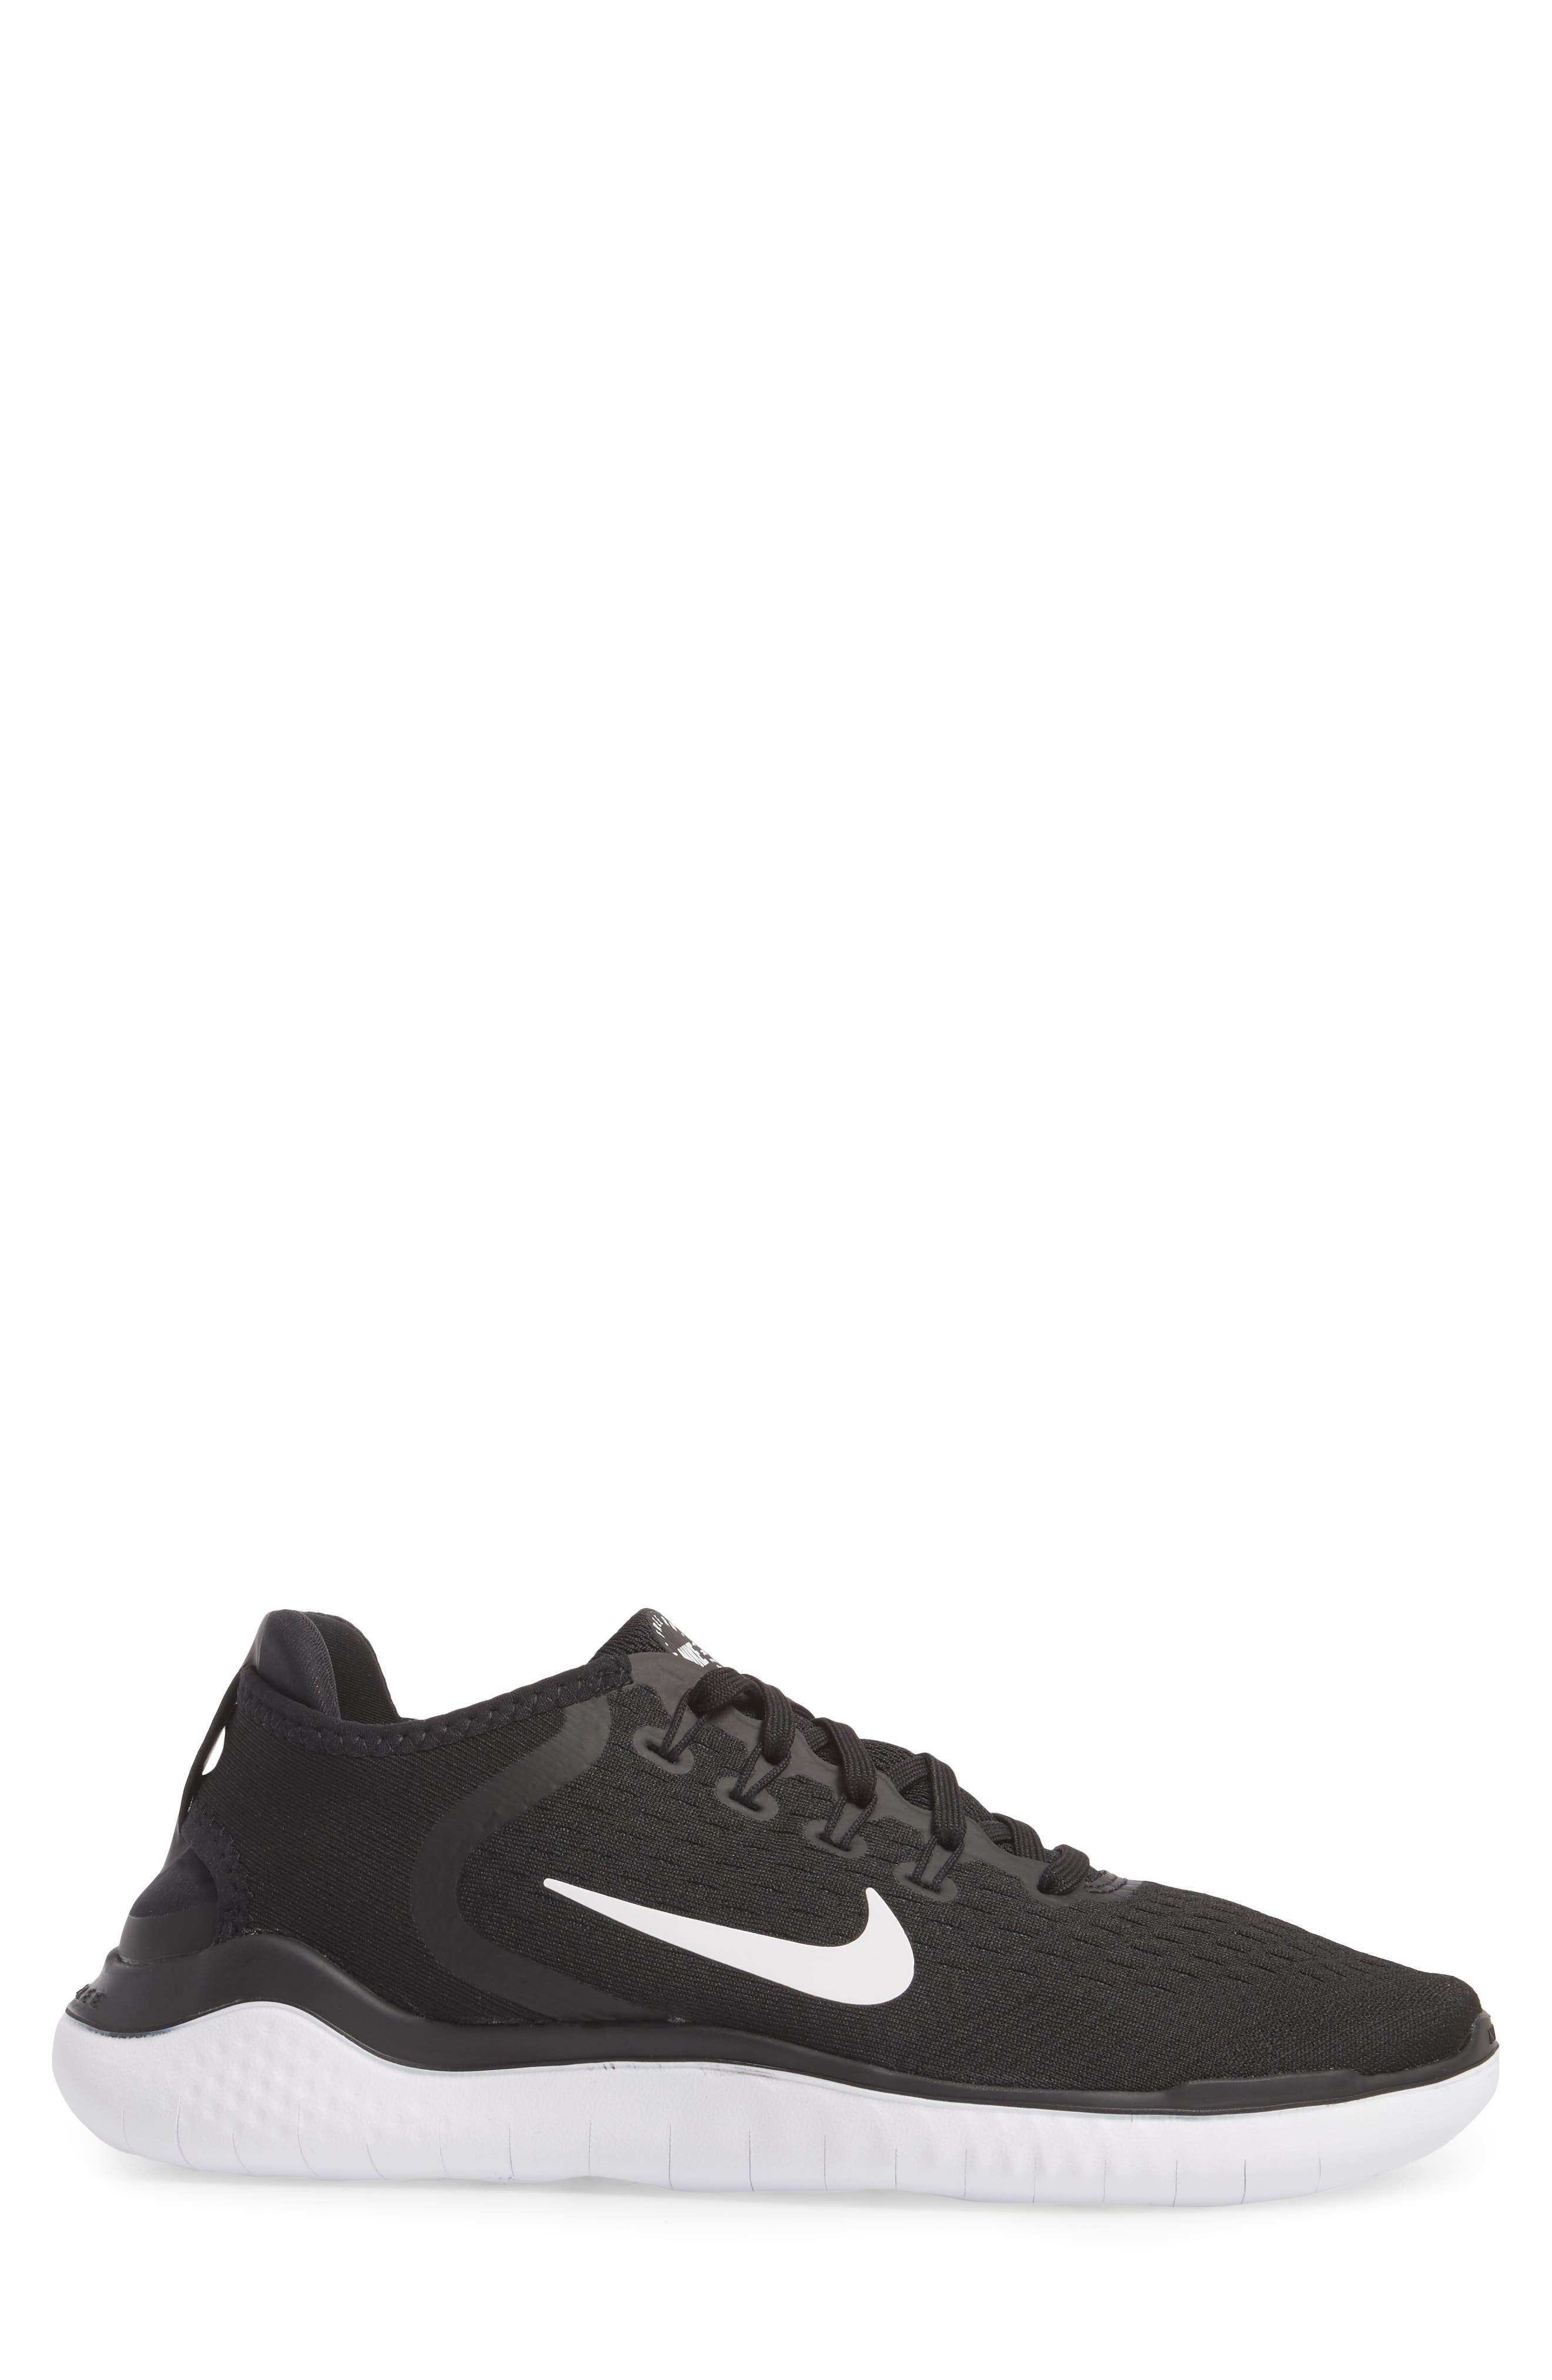 Free RN 2018 Running Shoe,                             Alternate thumbnail 3, color,                             BLACK/ WHITE